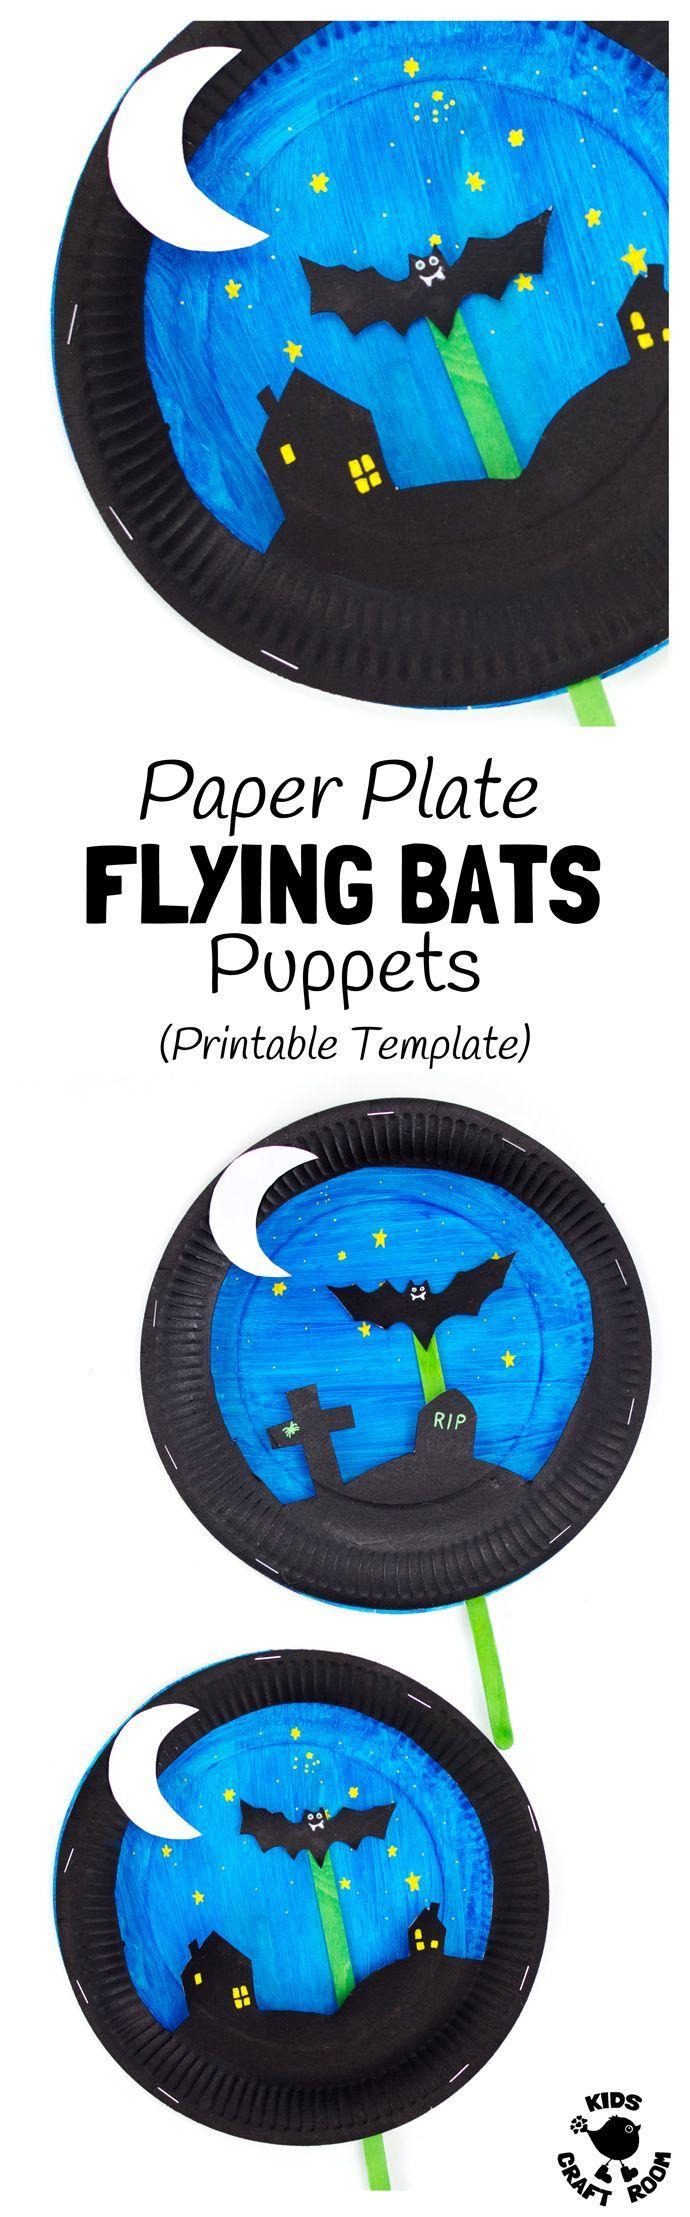 Paper Plate Bat Puppet Craft  sc 1 st  Pinterest & Paper Plate Bat Puppet Craft | Puppet crafts Imaginative play and ...